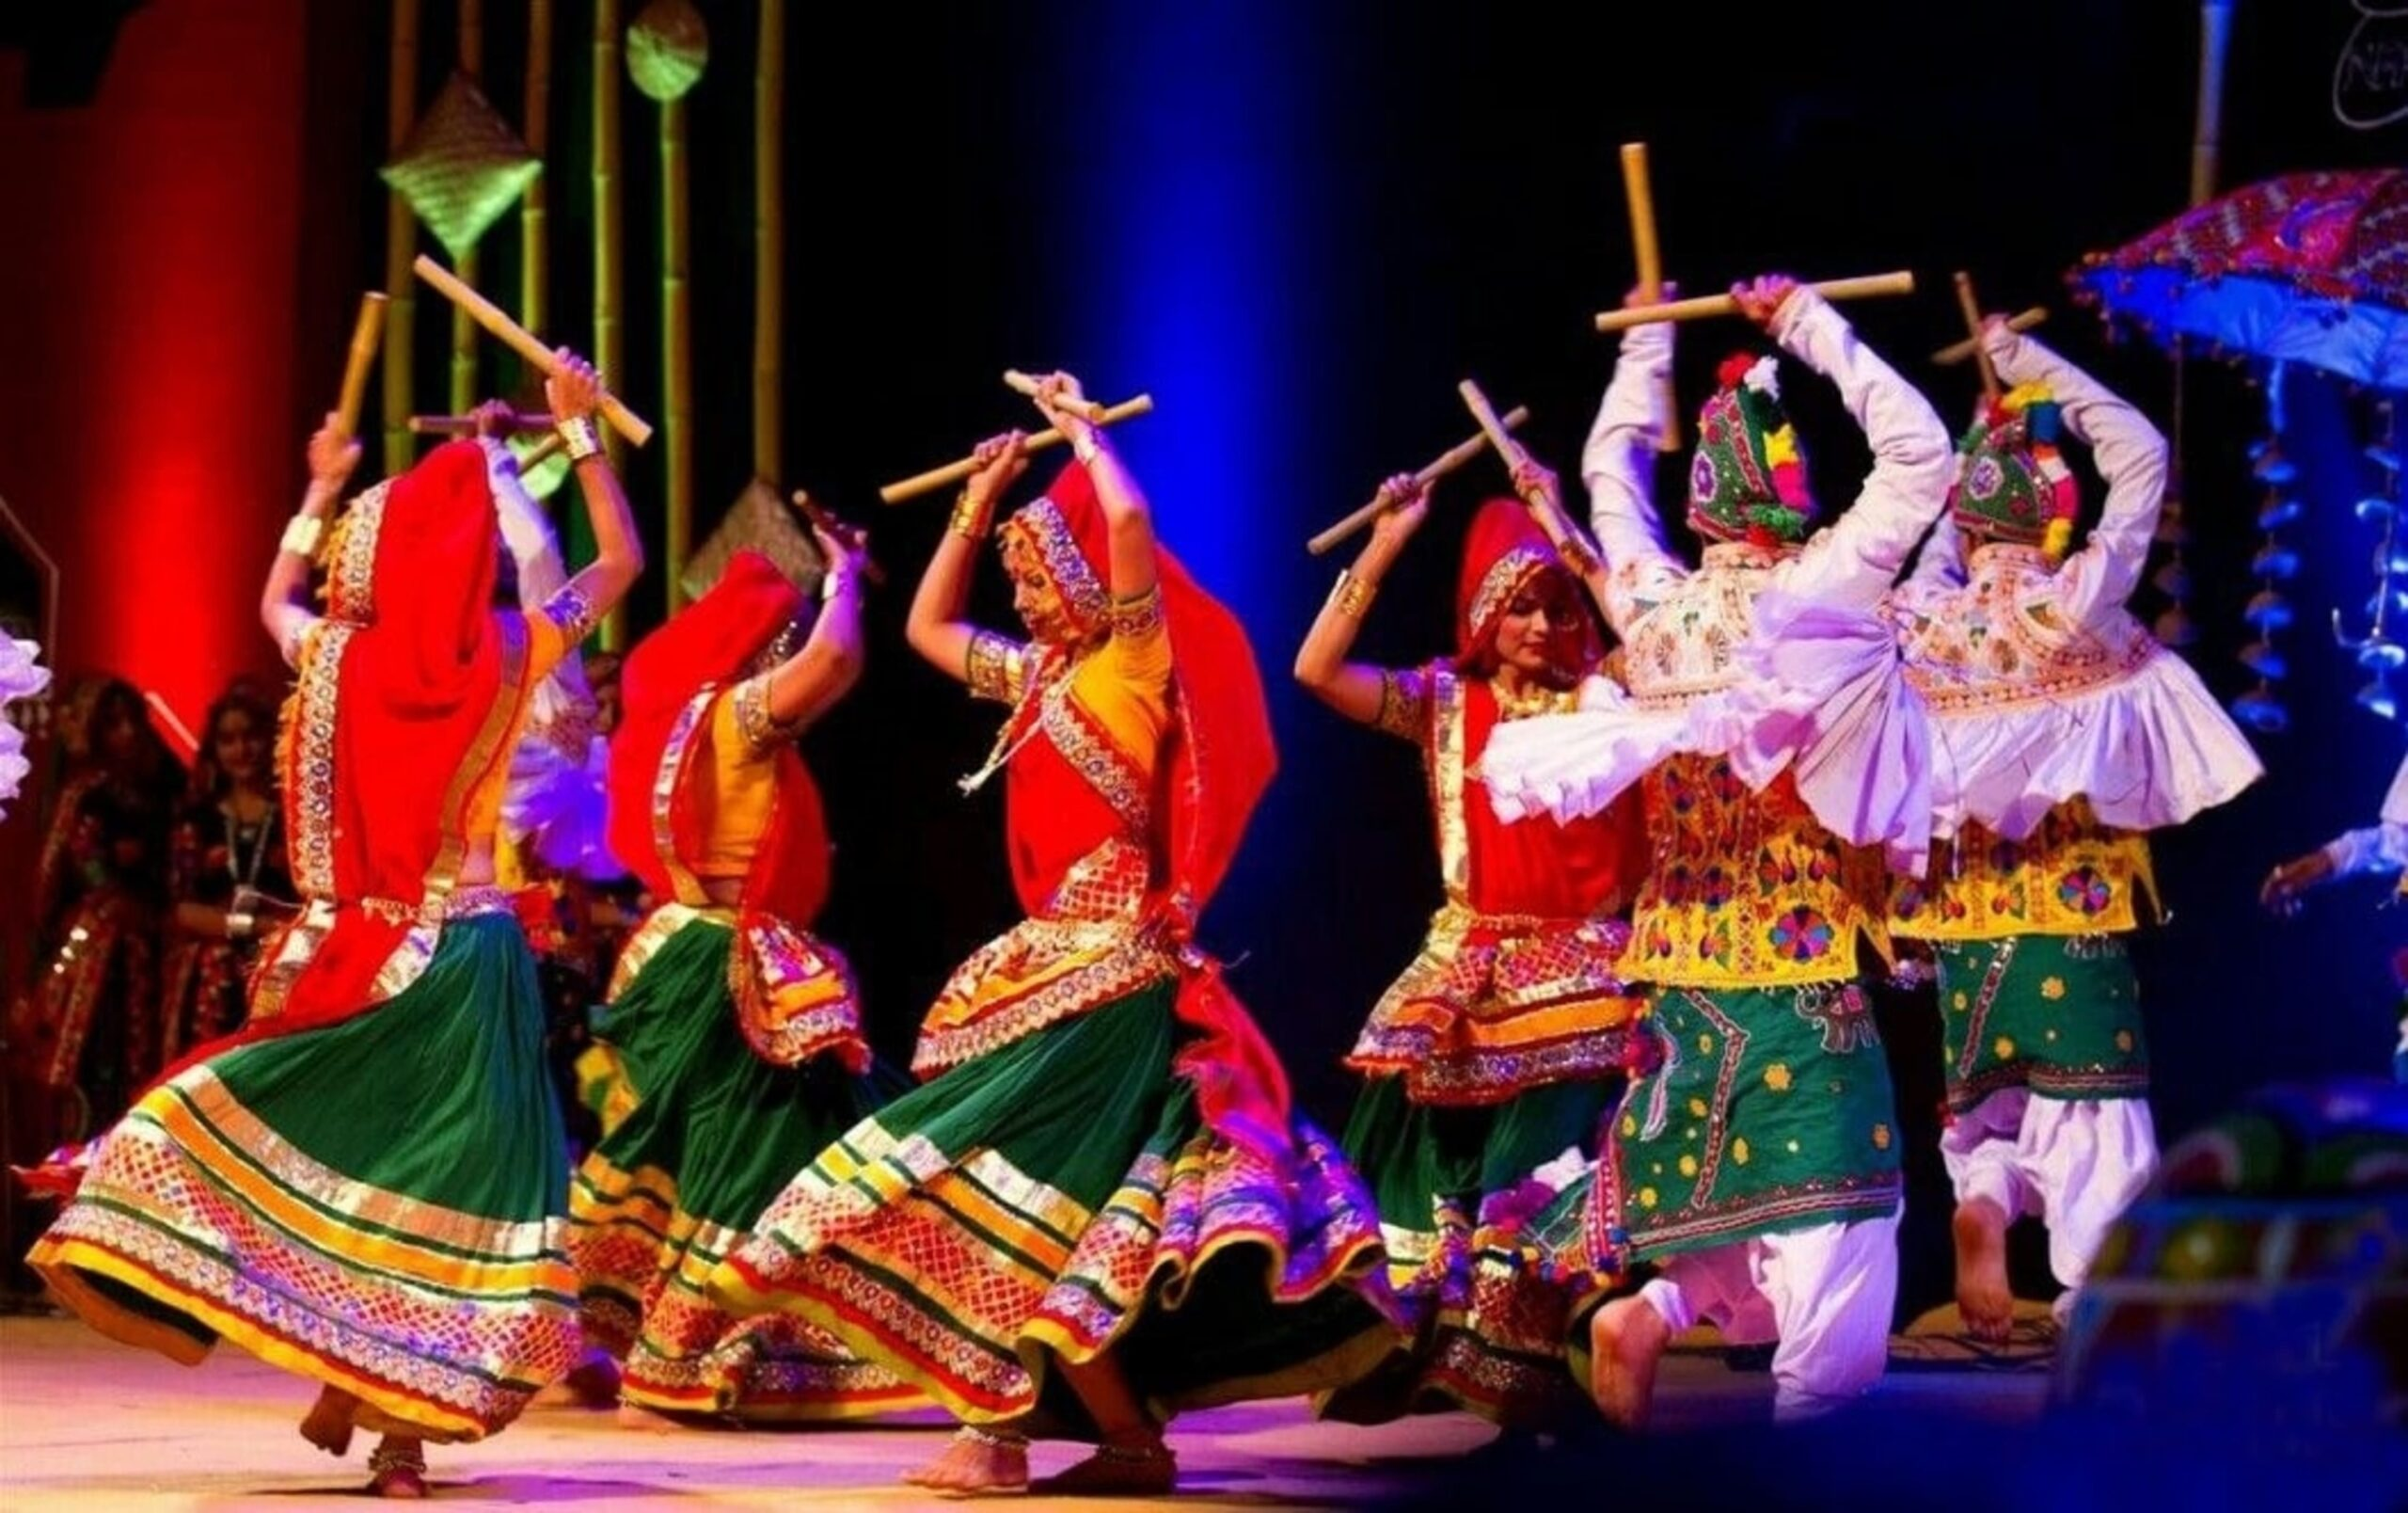 Dandia dance during Navratri celebration | PC - ST Photography (Pinterest)